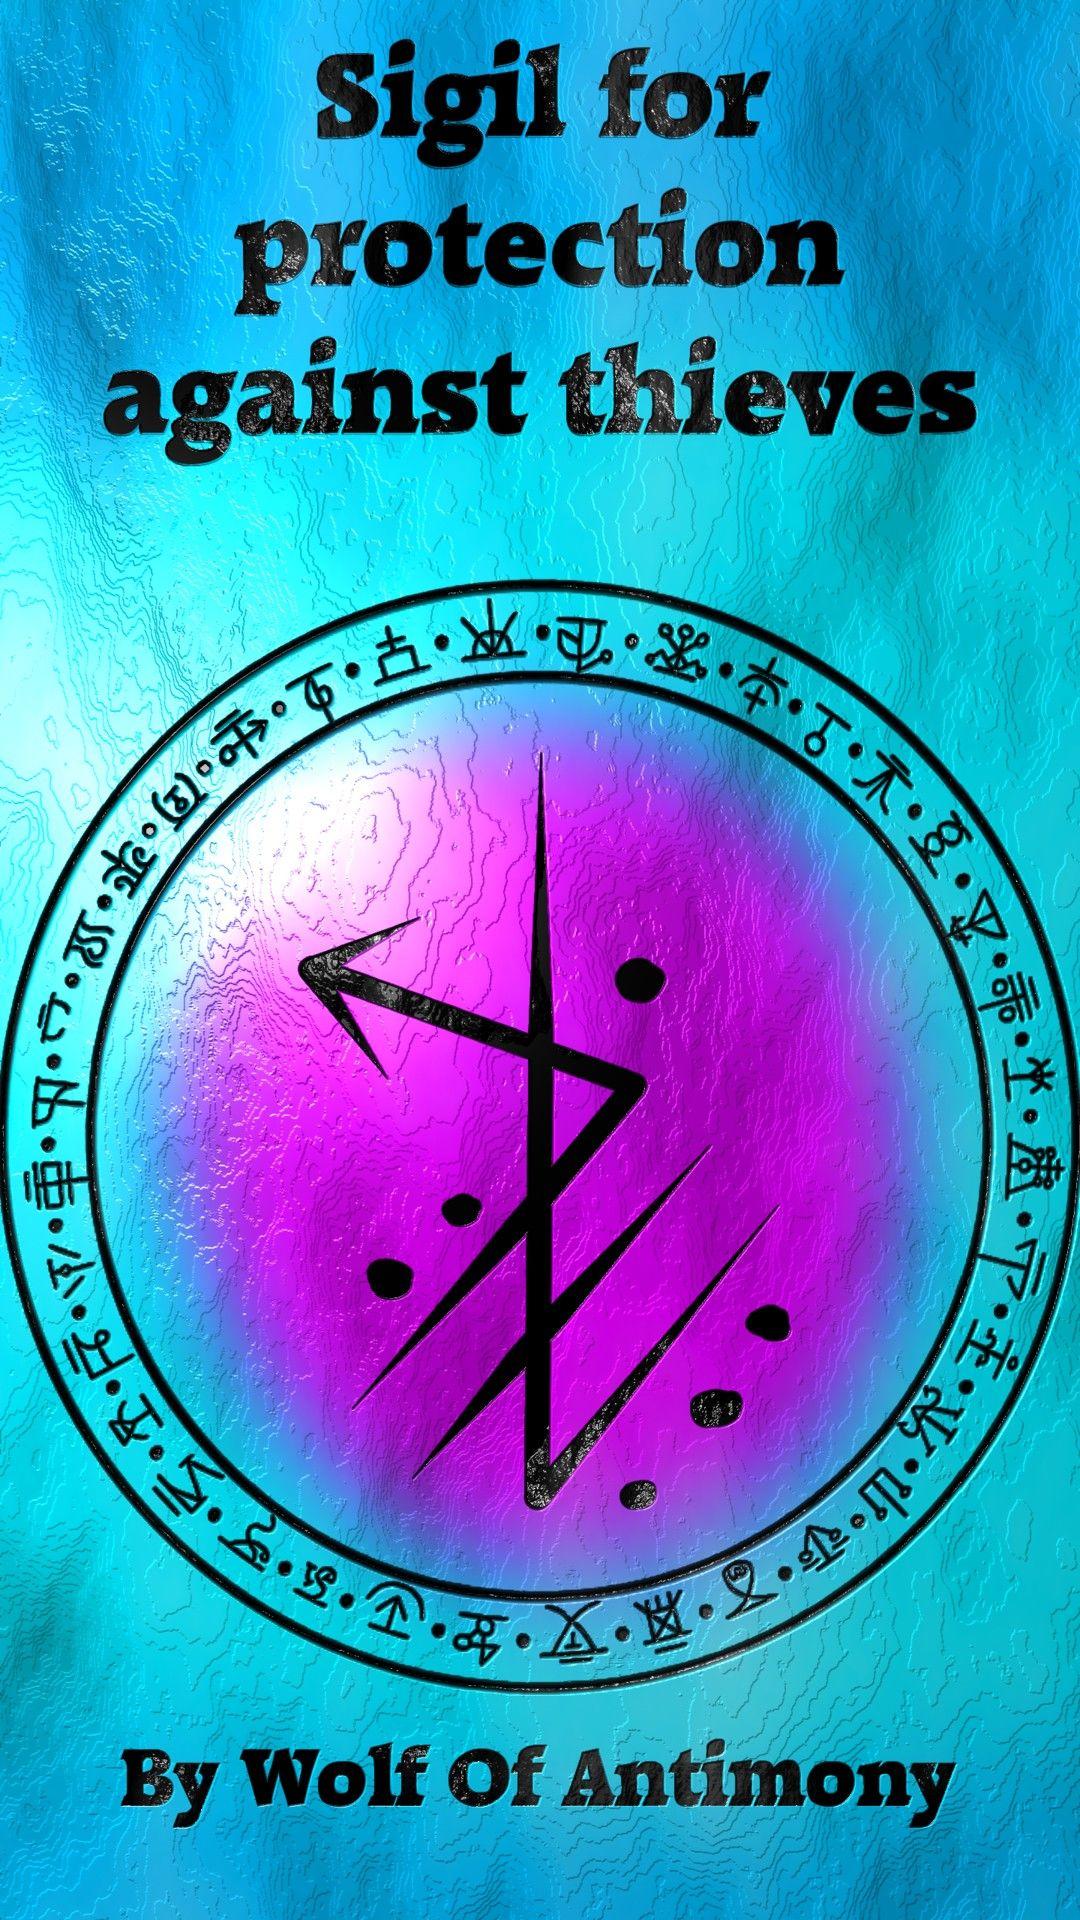 Pin by Raven Michelle Williams on Sigils | Magic symbols, Sigil